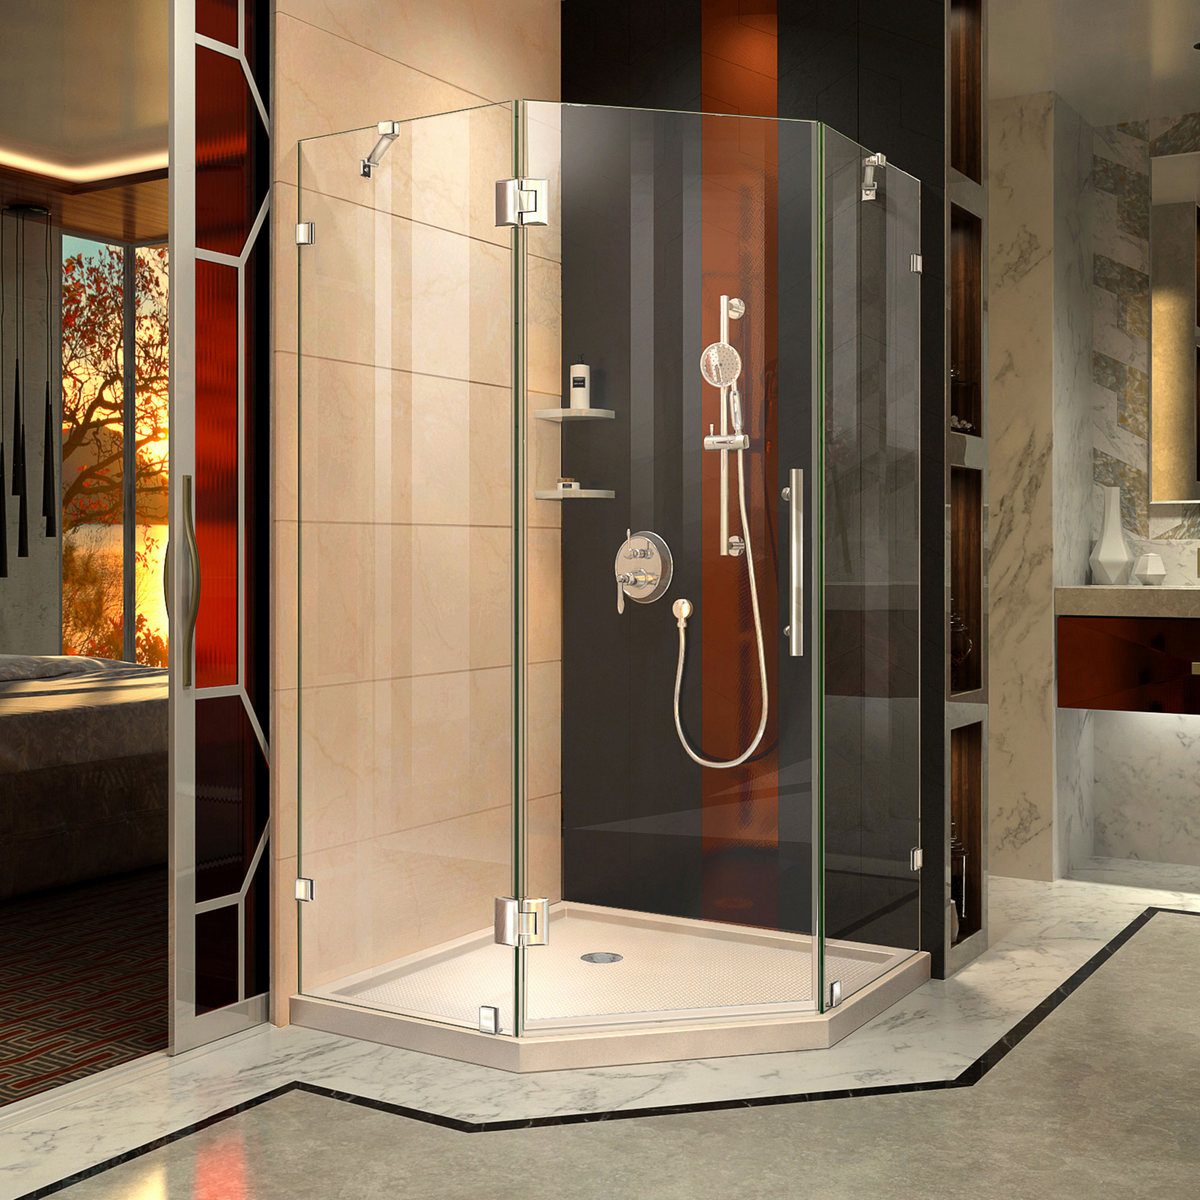 Dreamline Lux Hinged Shower Enclosure Chrome Corner Drain Biscuit Base Kit